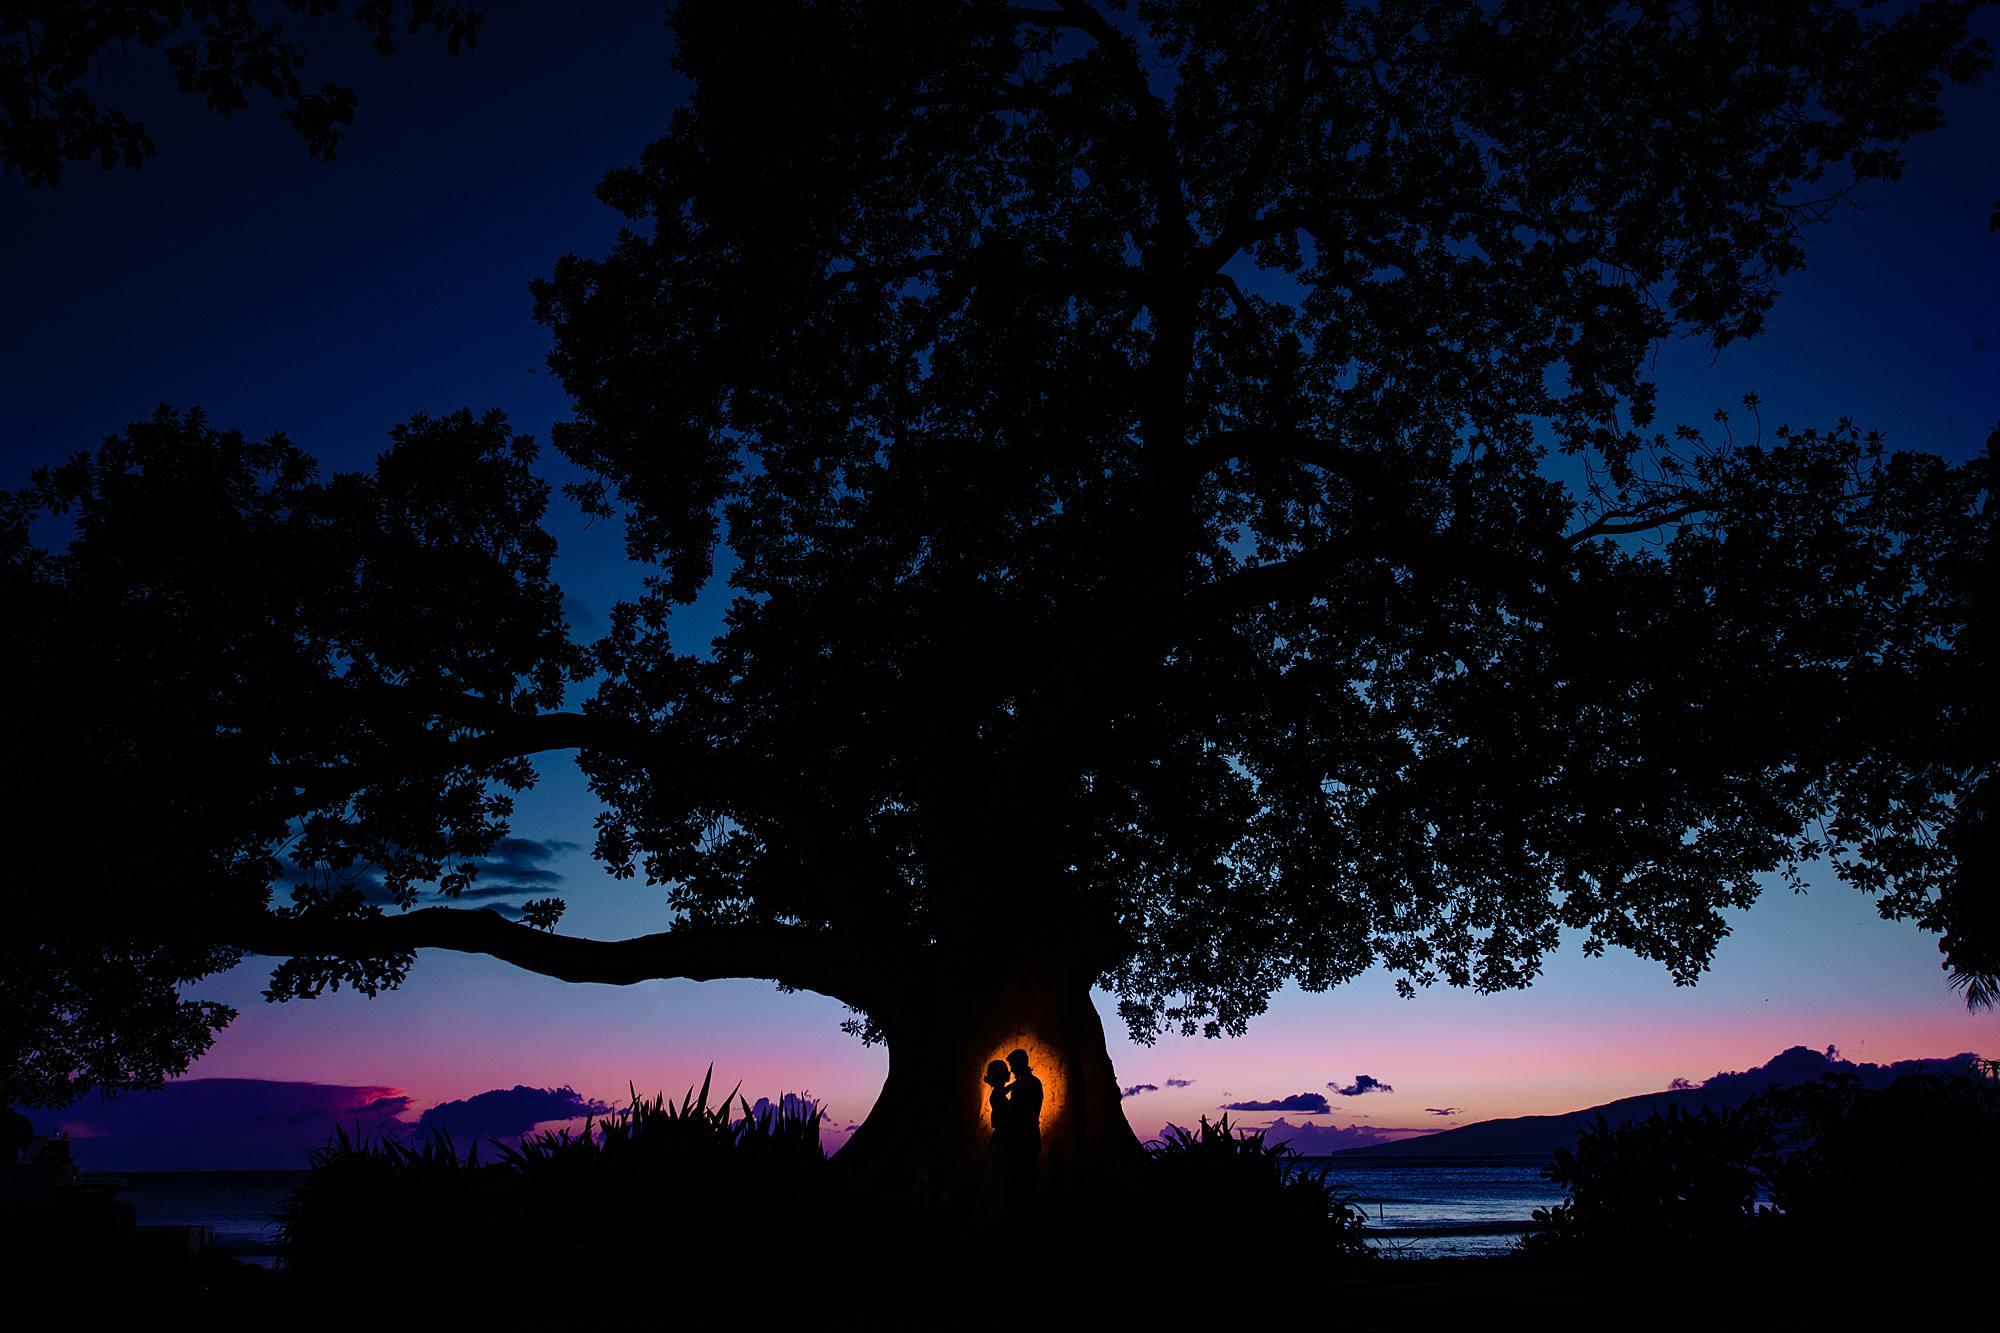 magnet mod photo with tree at olowalu plantation house